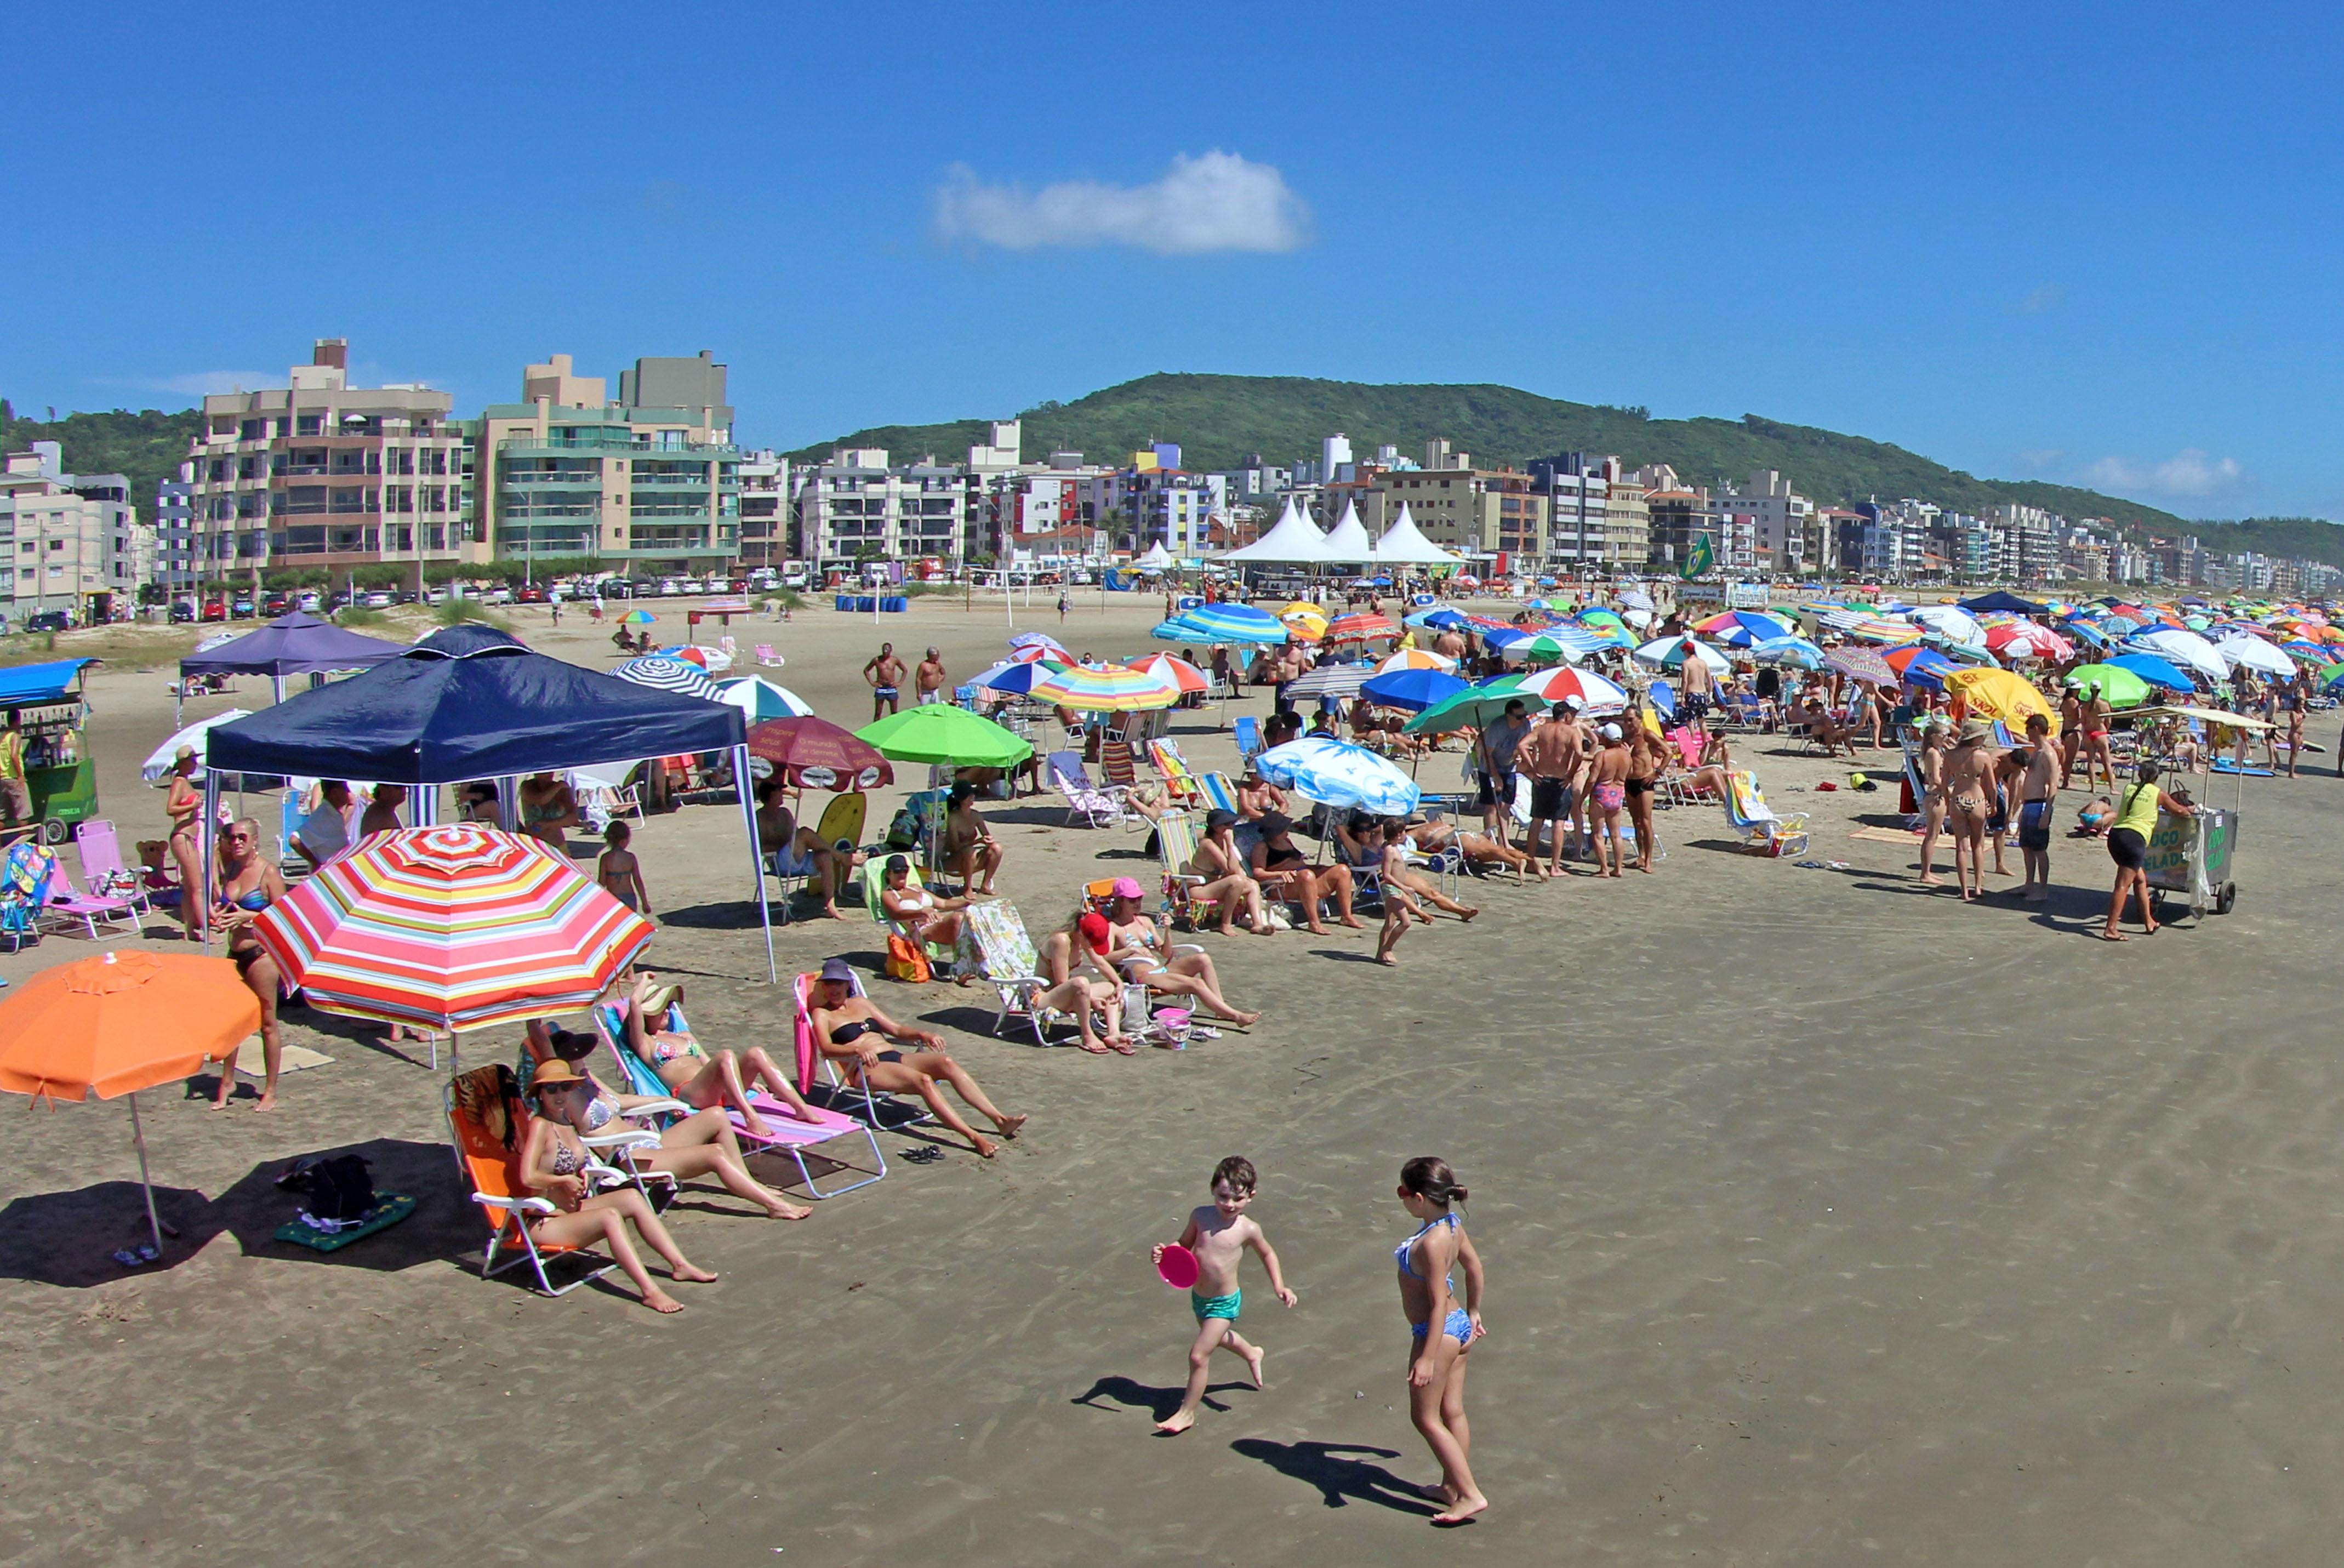 Bate e volta pelas praias de Santa Catarina